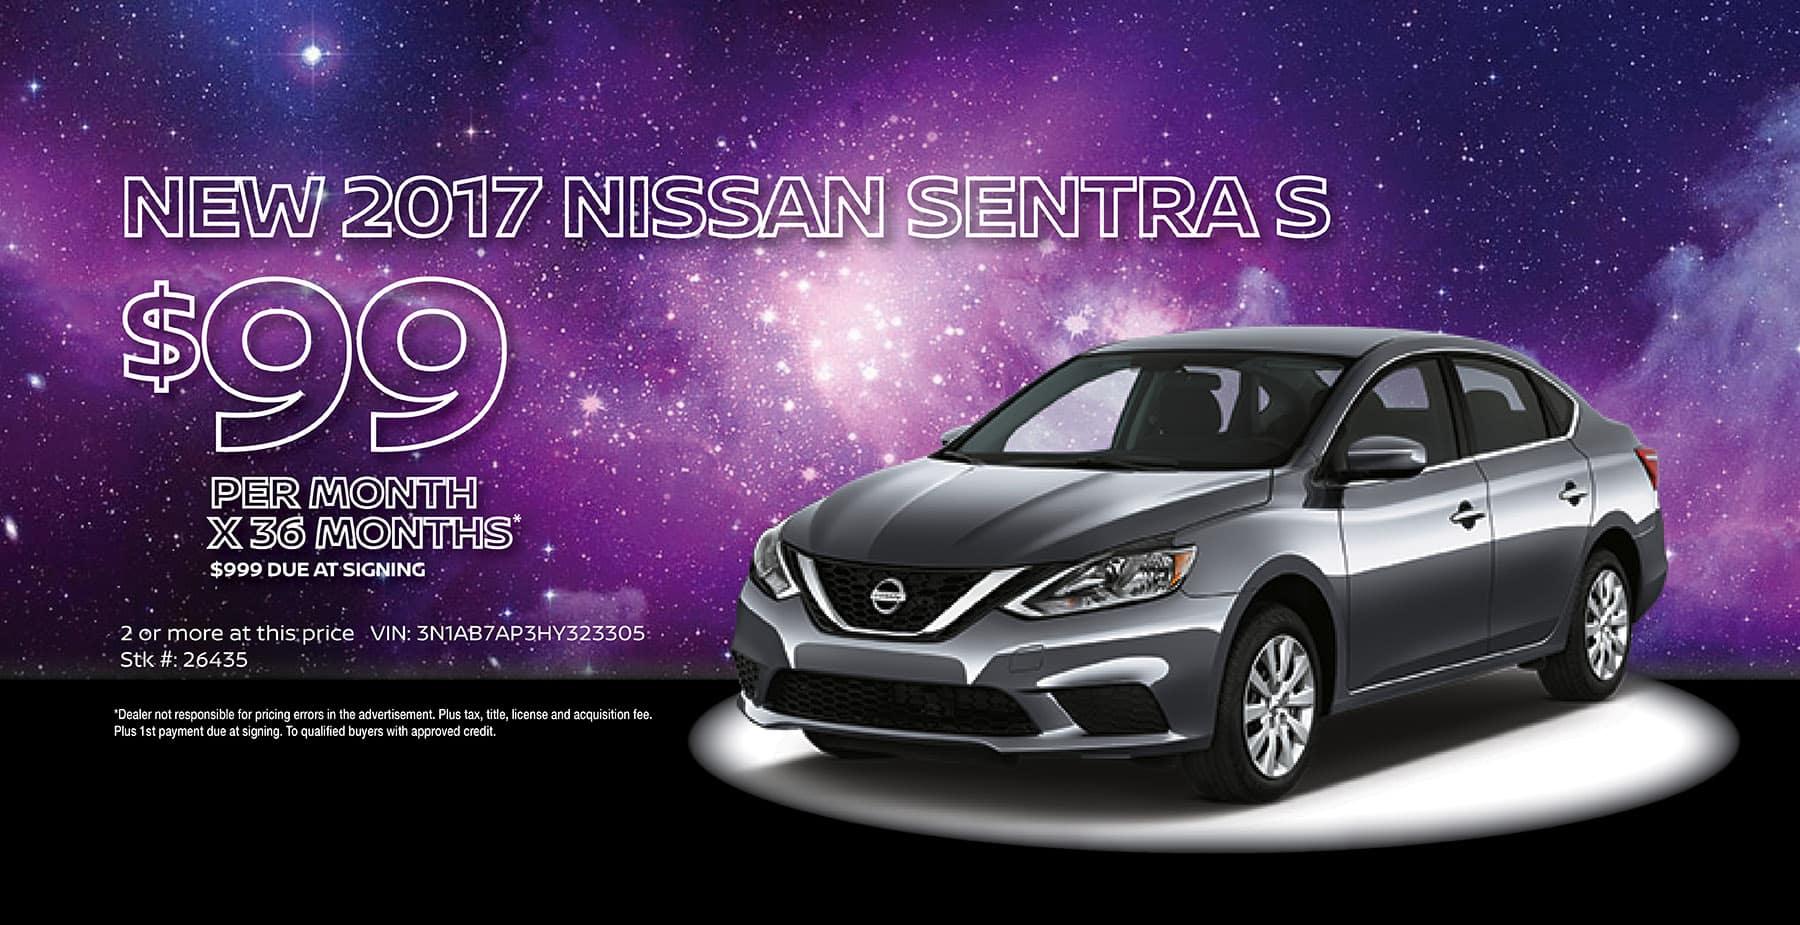 2017 Nissan Sentra December Holiday Sale at Star Nissan